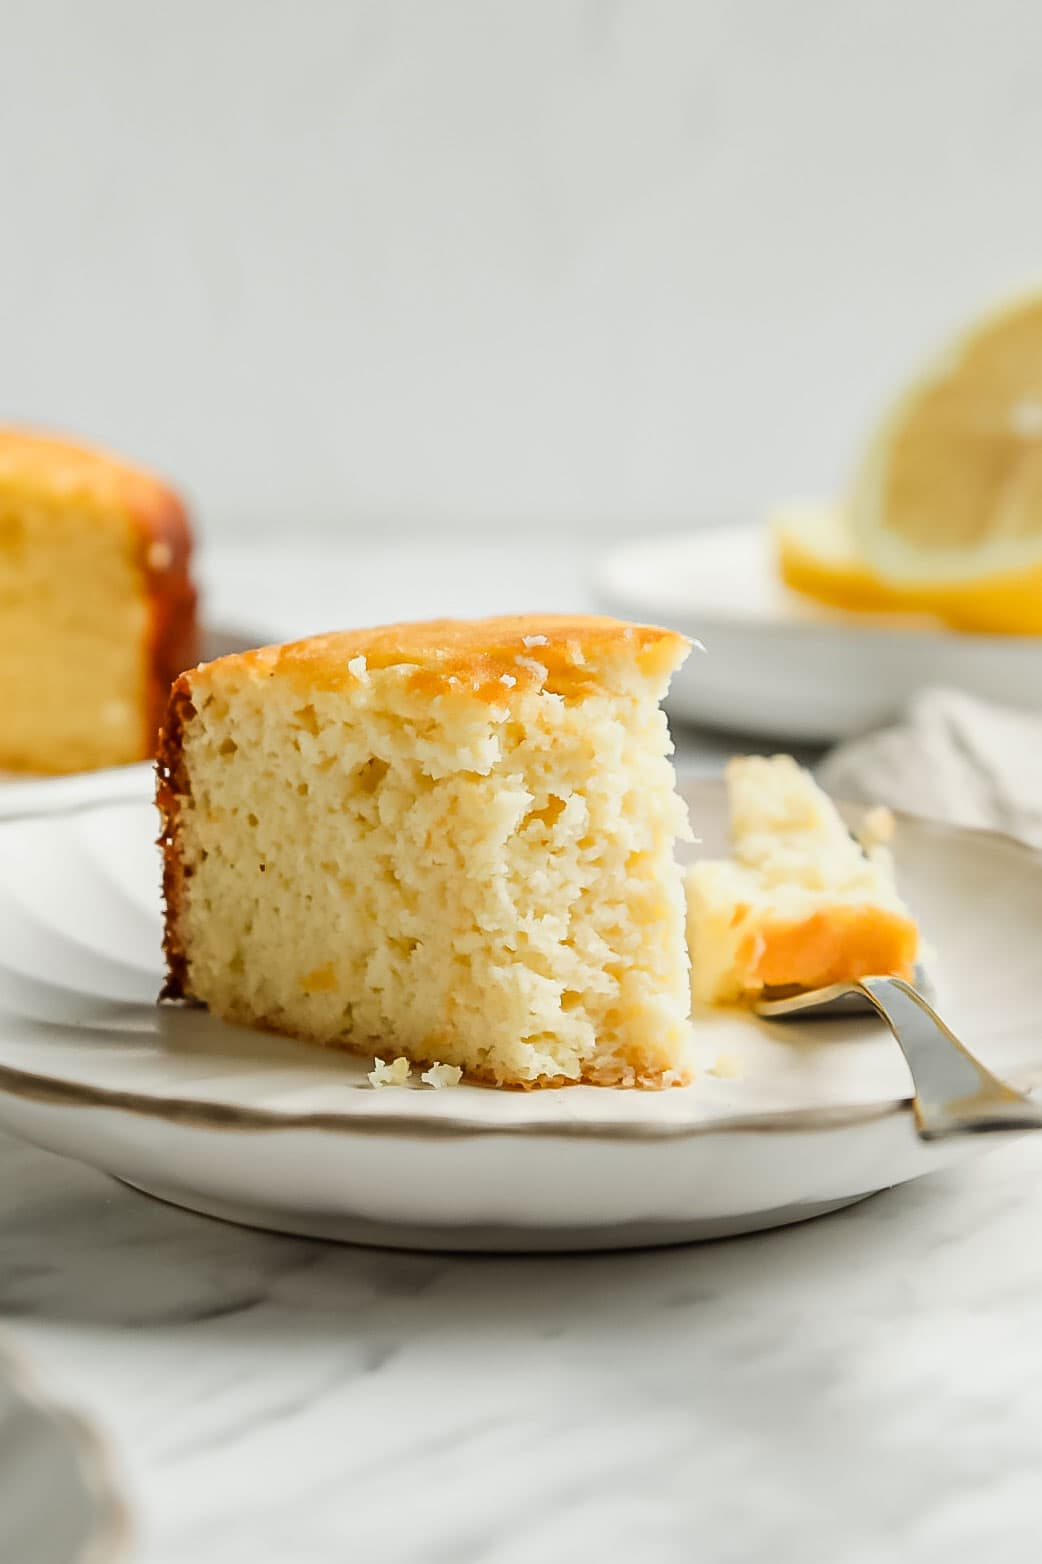 Slice of keto lemon cake with bite taken off with small dessert fork